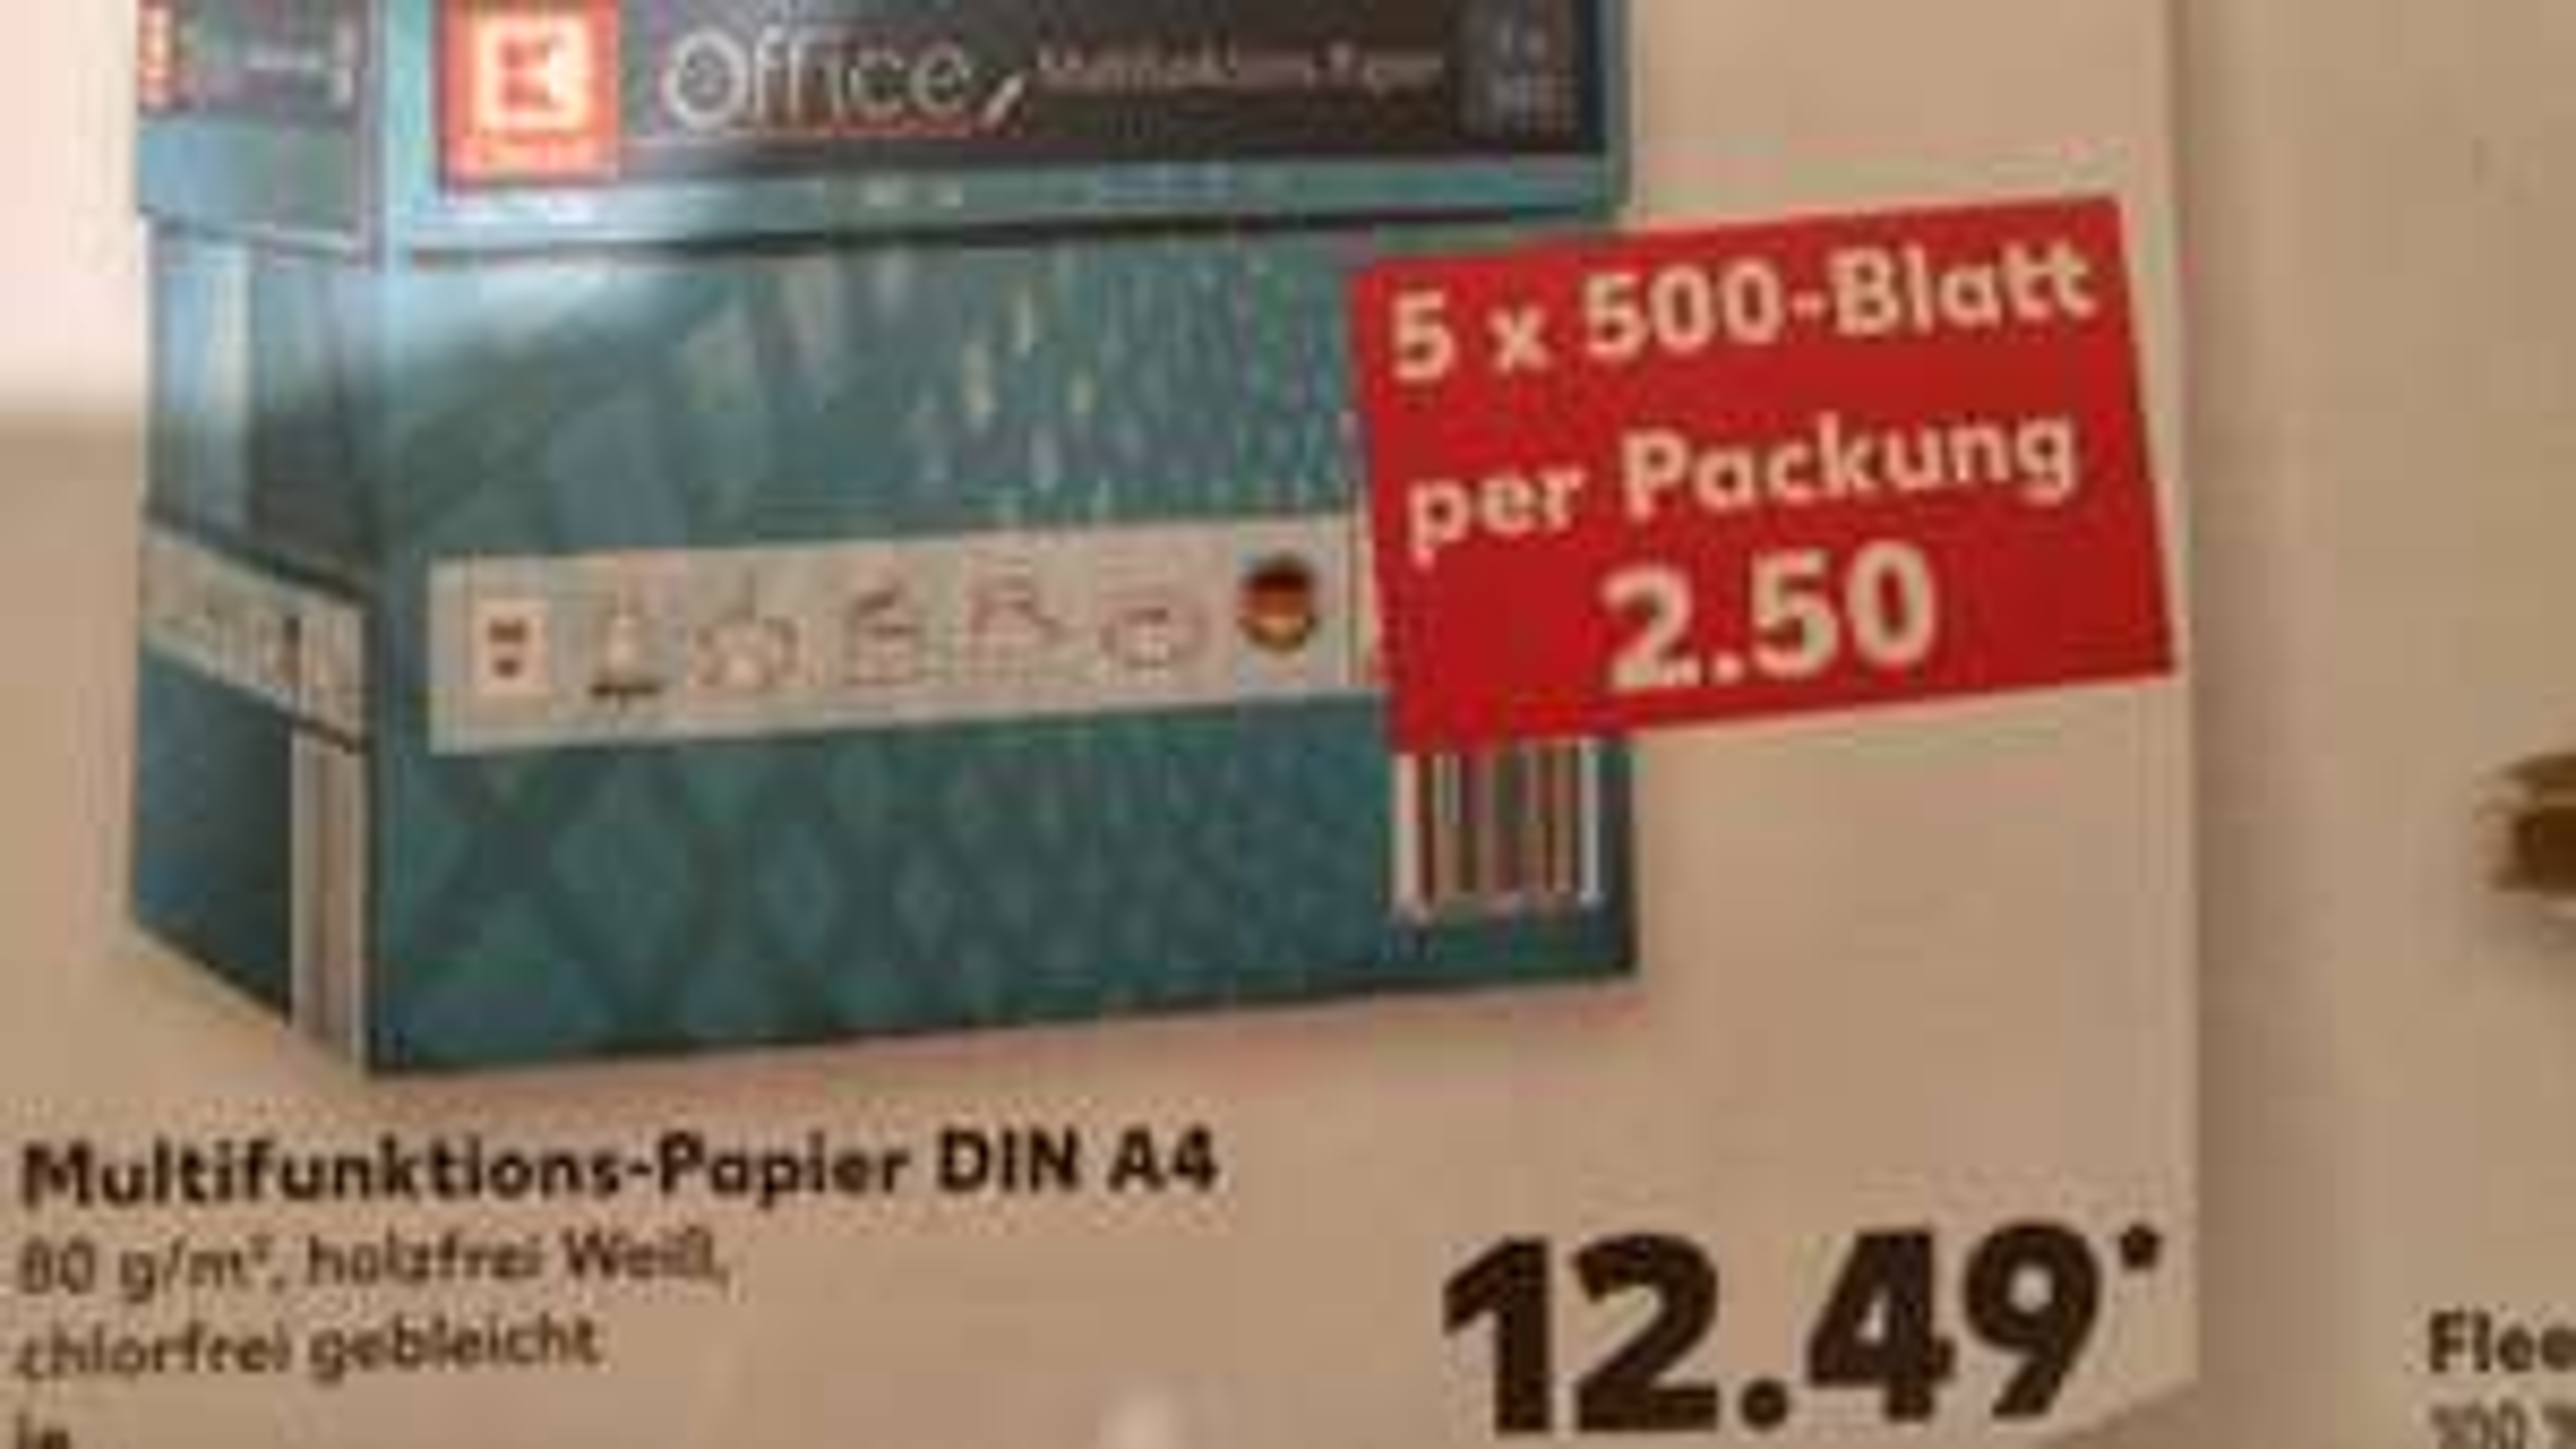 [Offline] Kaufland 5x500 Blatt Kopierpapier 12,49 € ab 26.05.